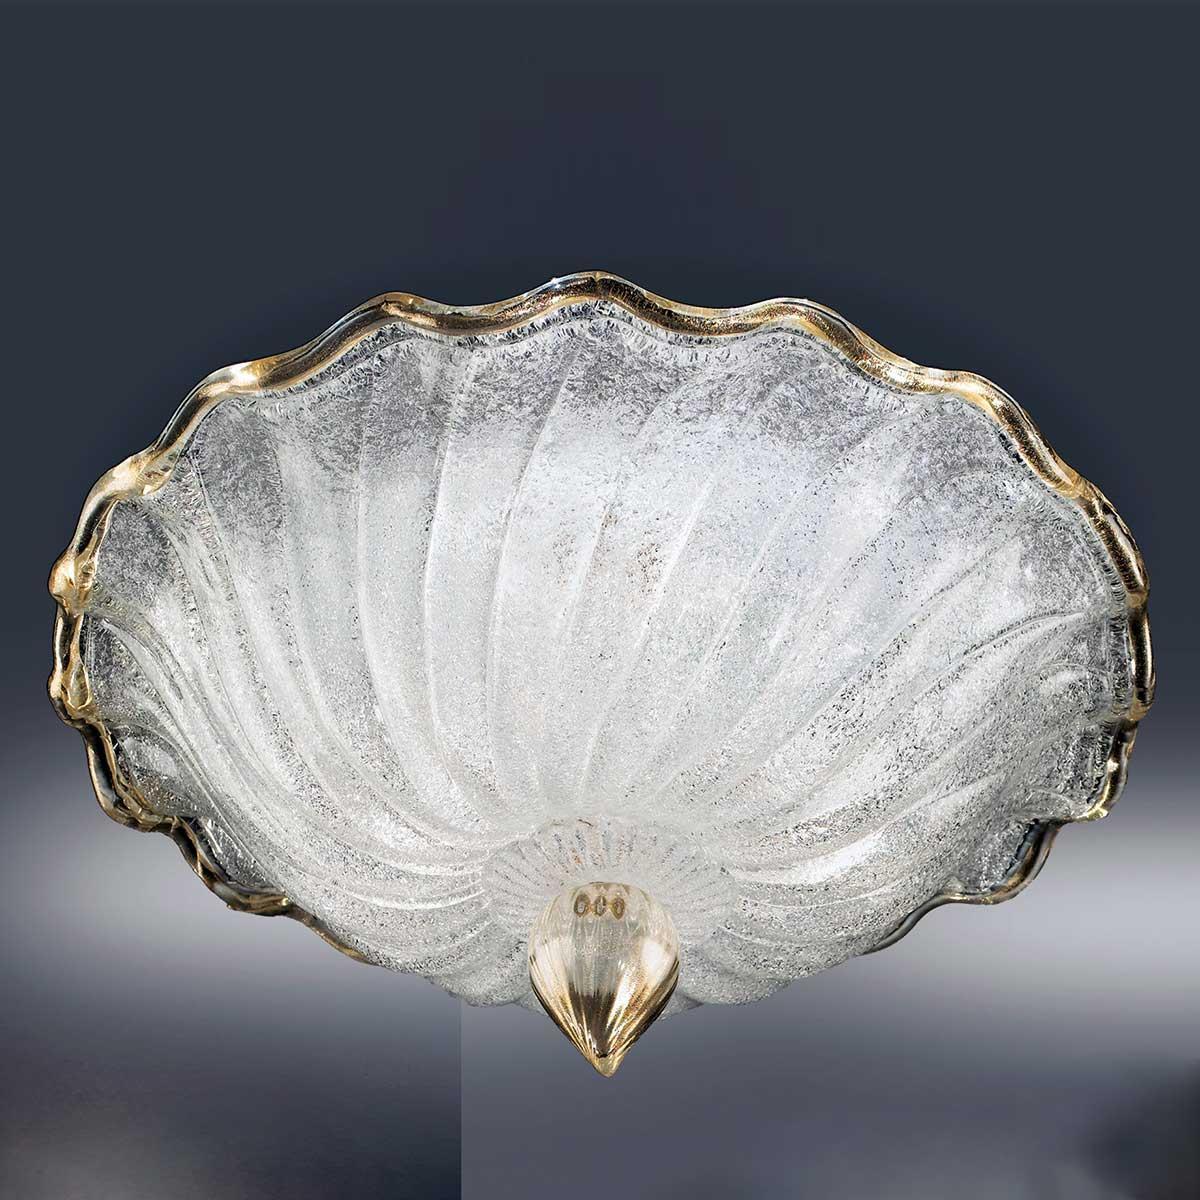 """Conchiglia"" Murano glass ceiling light - 3 lights - transparent and gold"